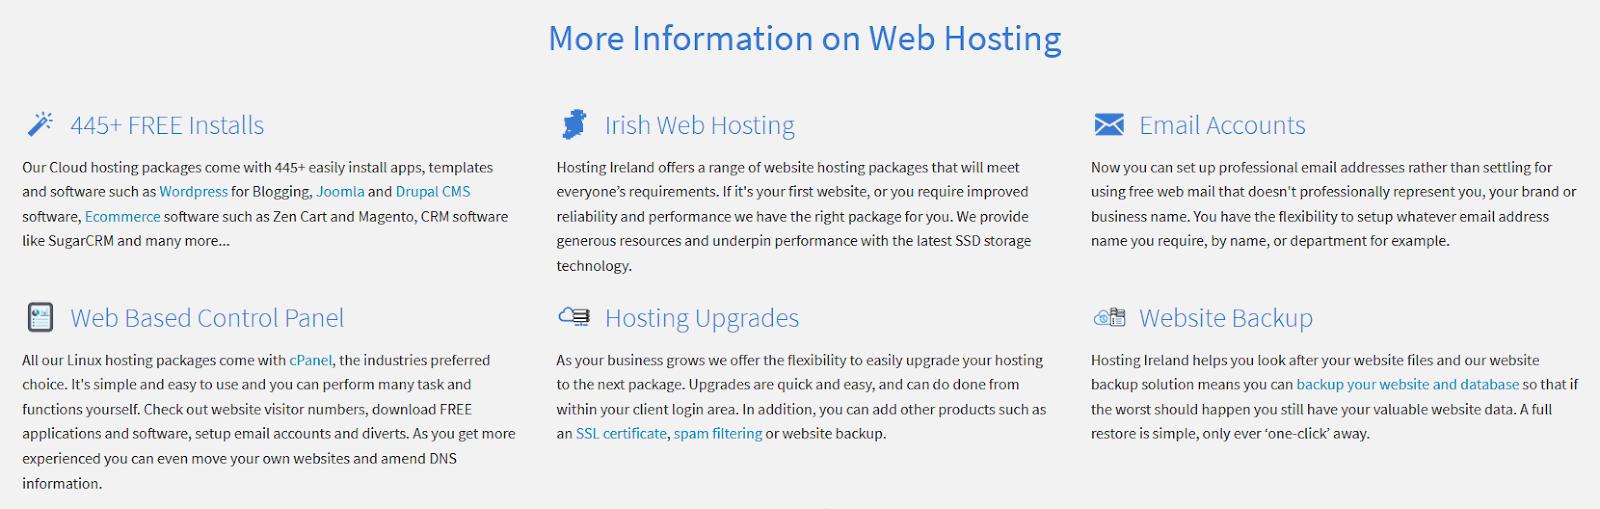 Screen capture of Hosting Ireland's feature details